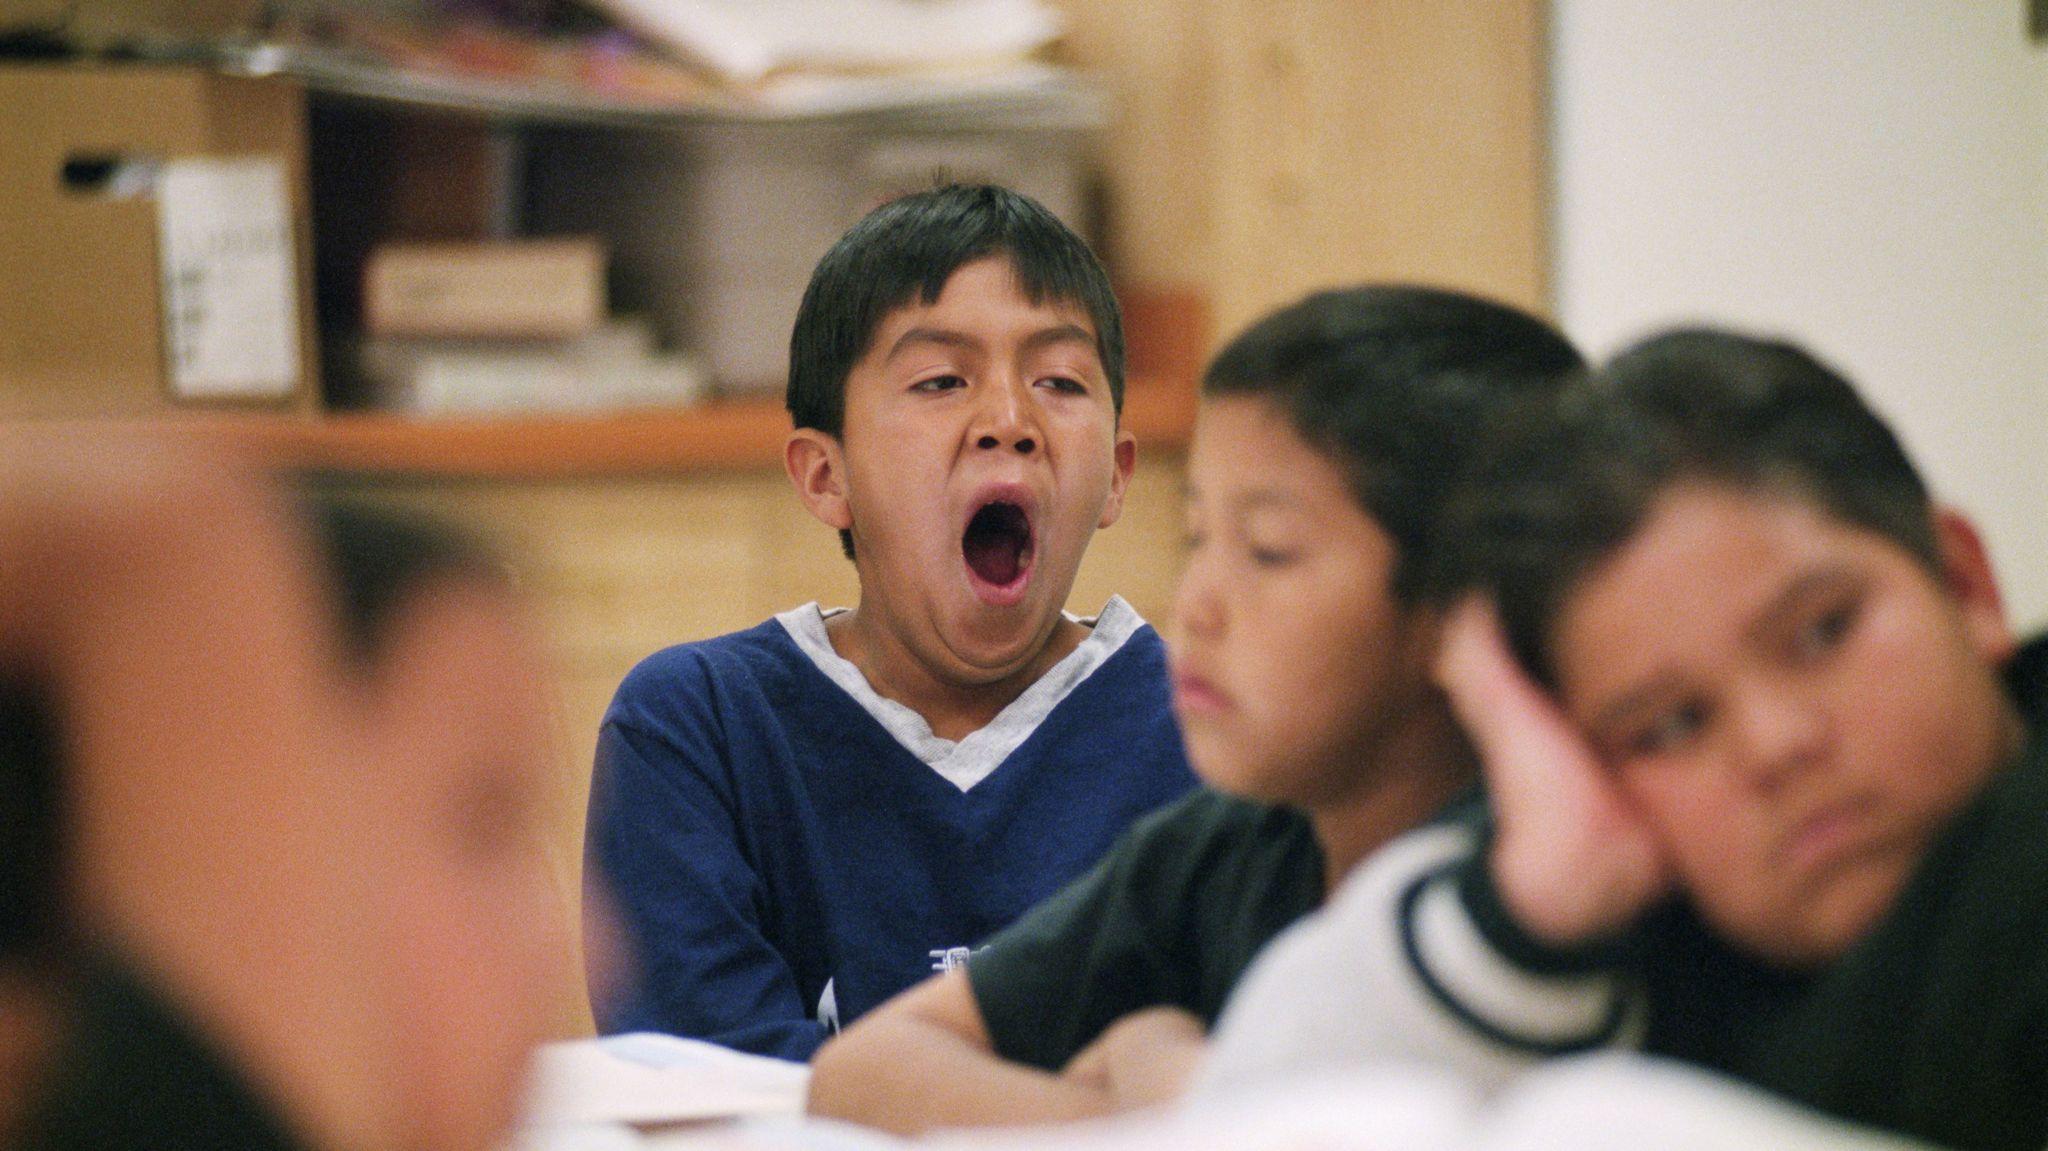 yawning-student